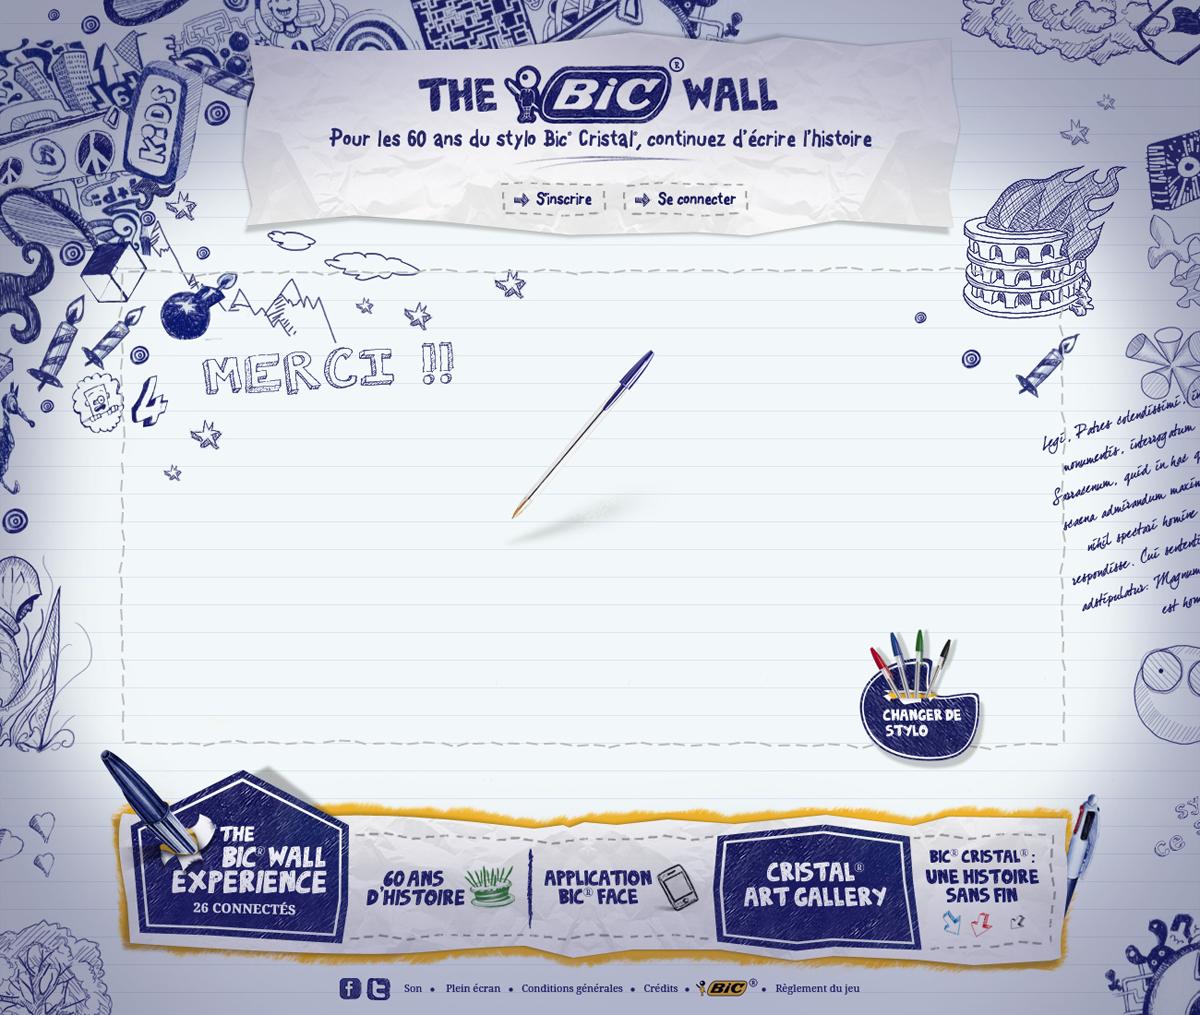 Big Youth - Bic : 60 ans du stylo Bic Cristal